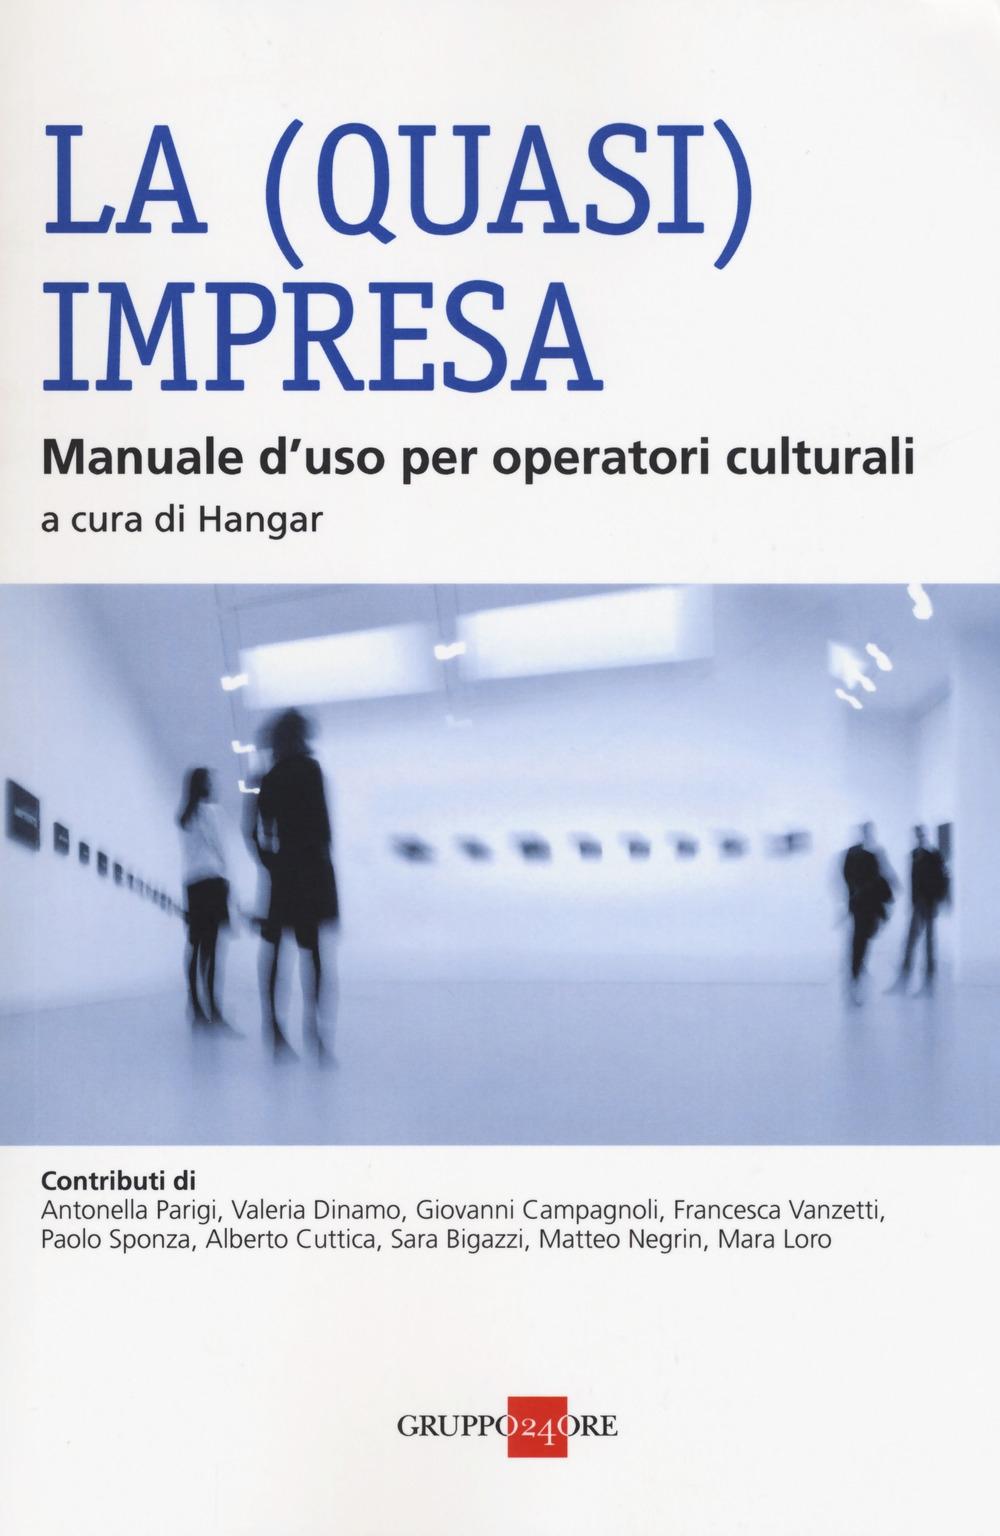 La (quasi) impresa. Manuale d'uso per operatori culturali